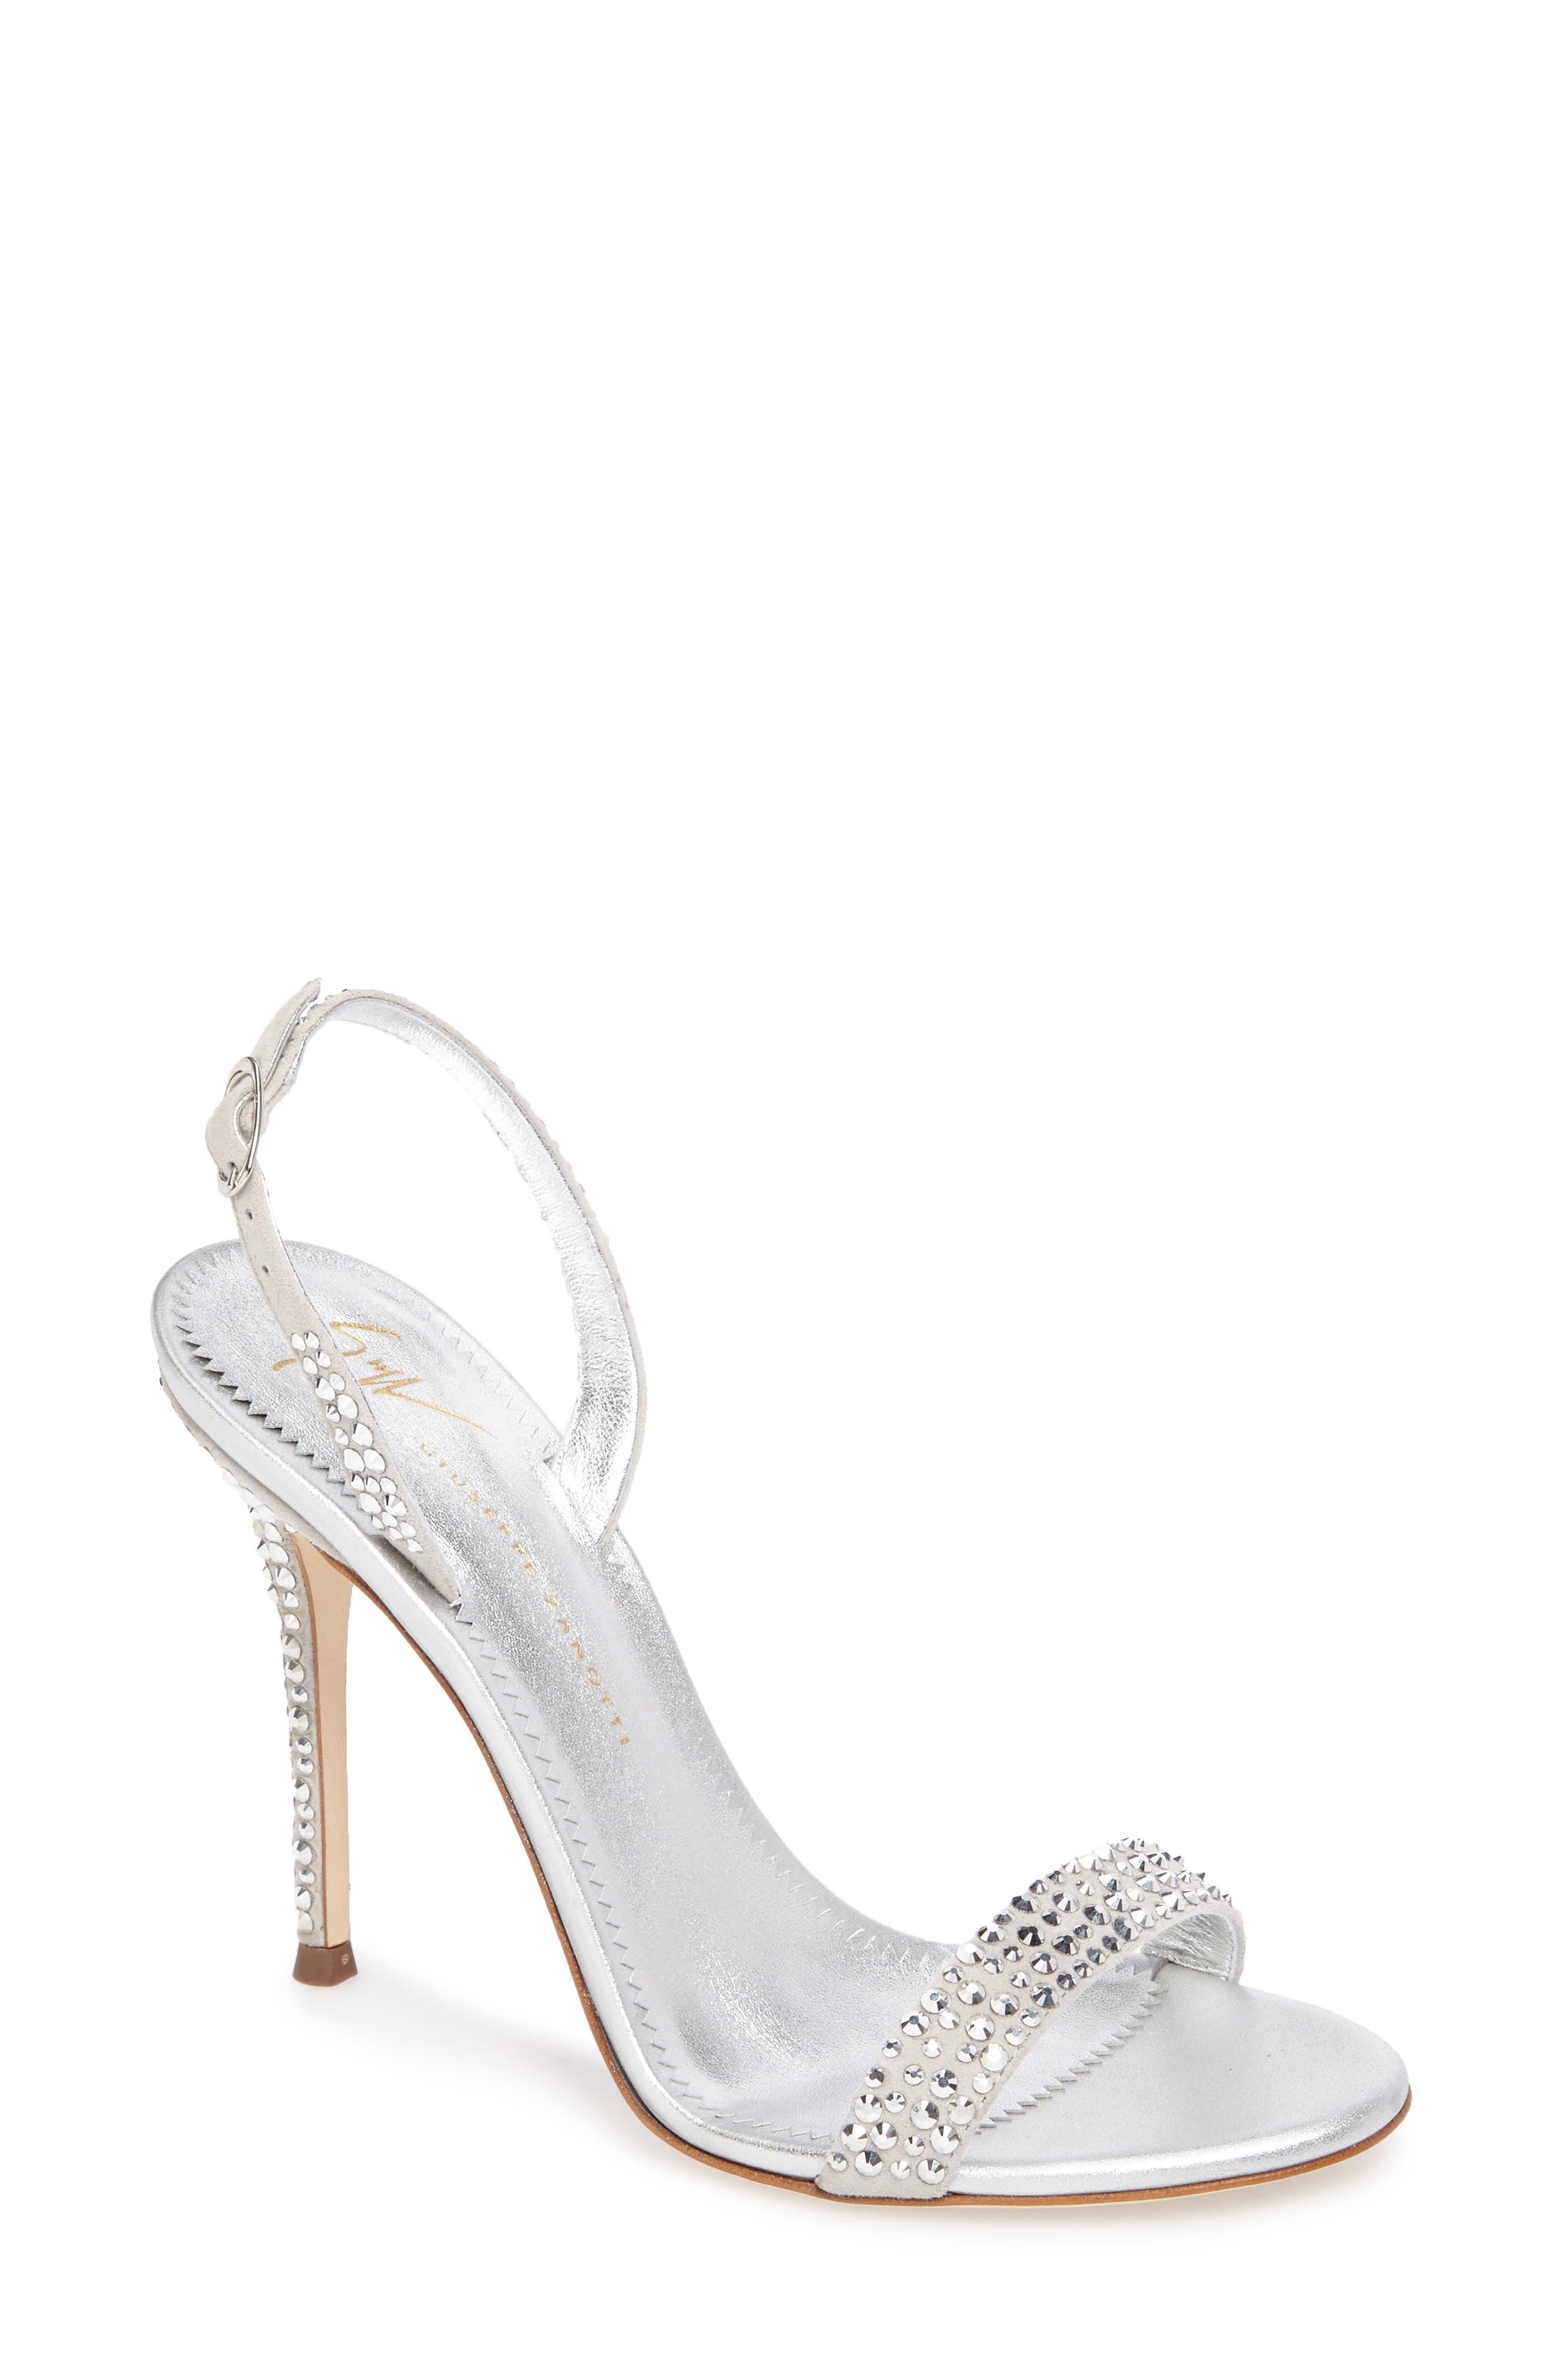 Musitco Crystal Embellished Slingback Sandal,                         Main,                         color, 054